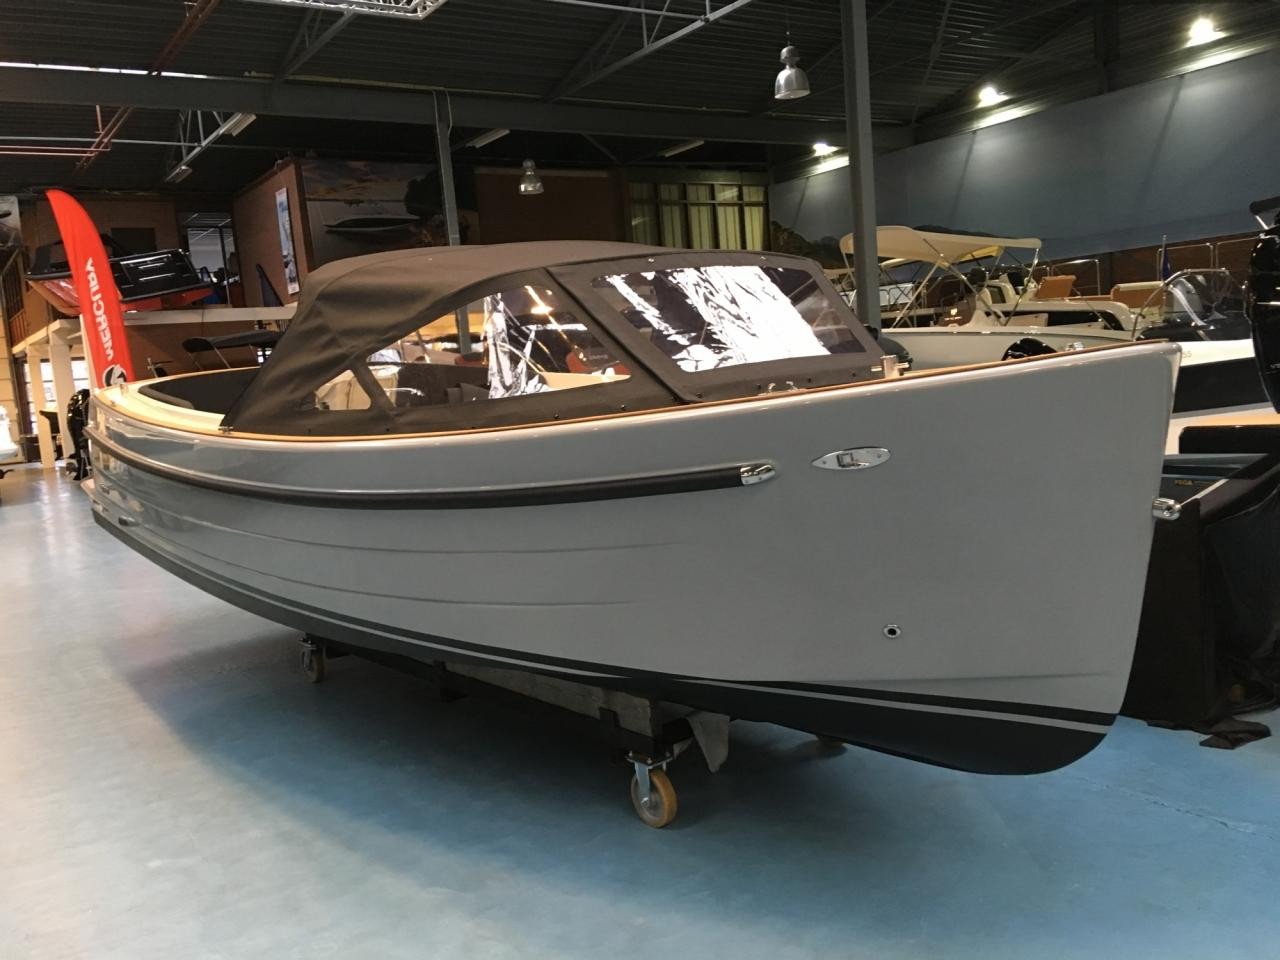 Antaris sixty6 grijs met 42 pk Vetus 5